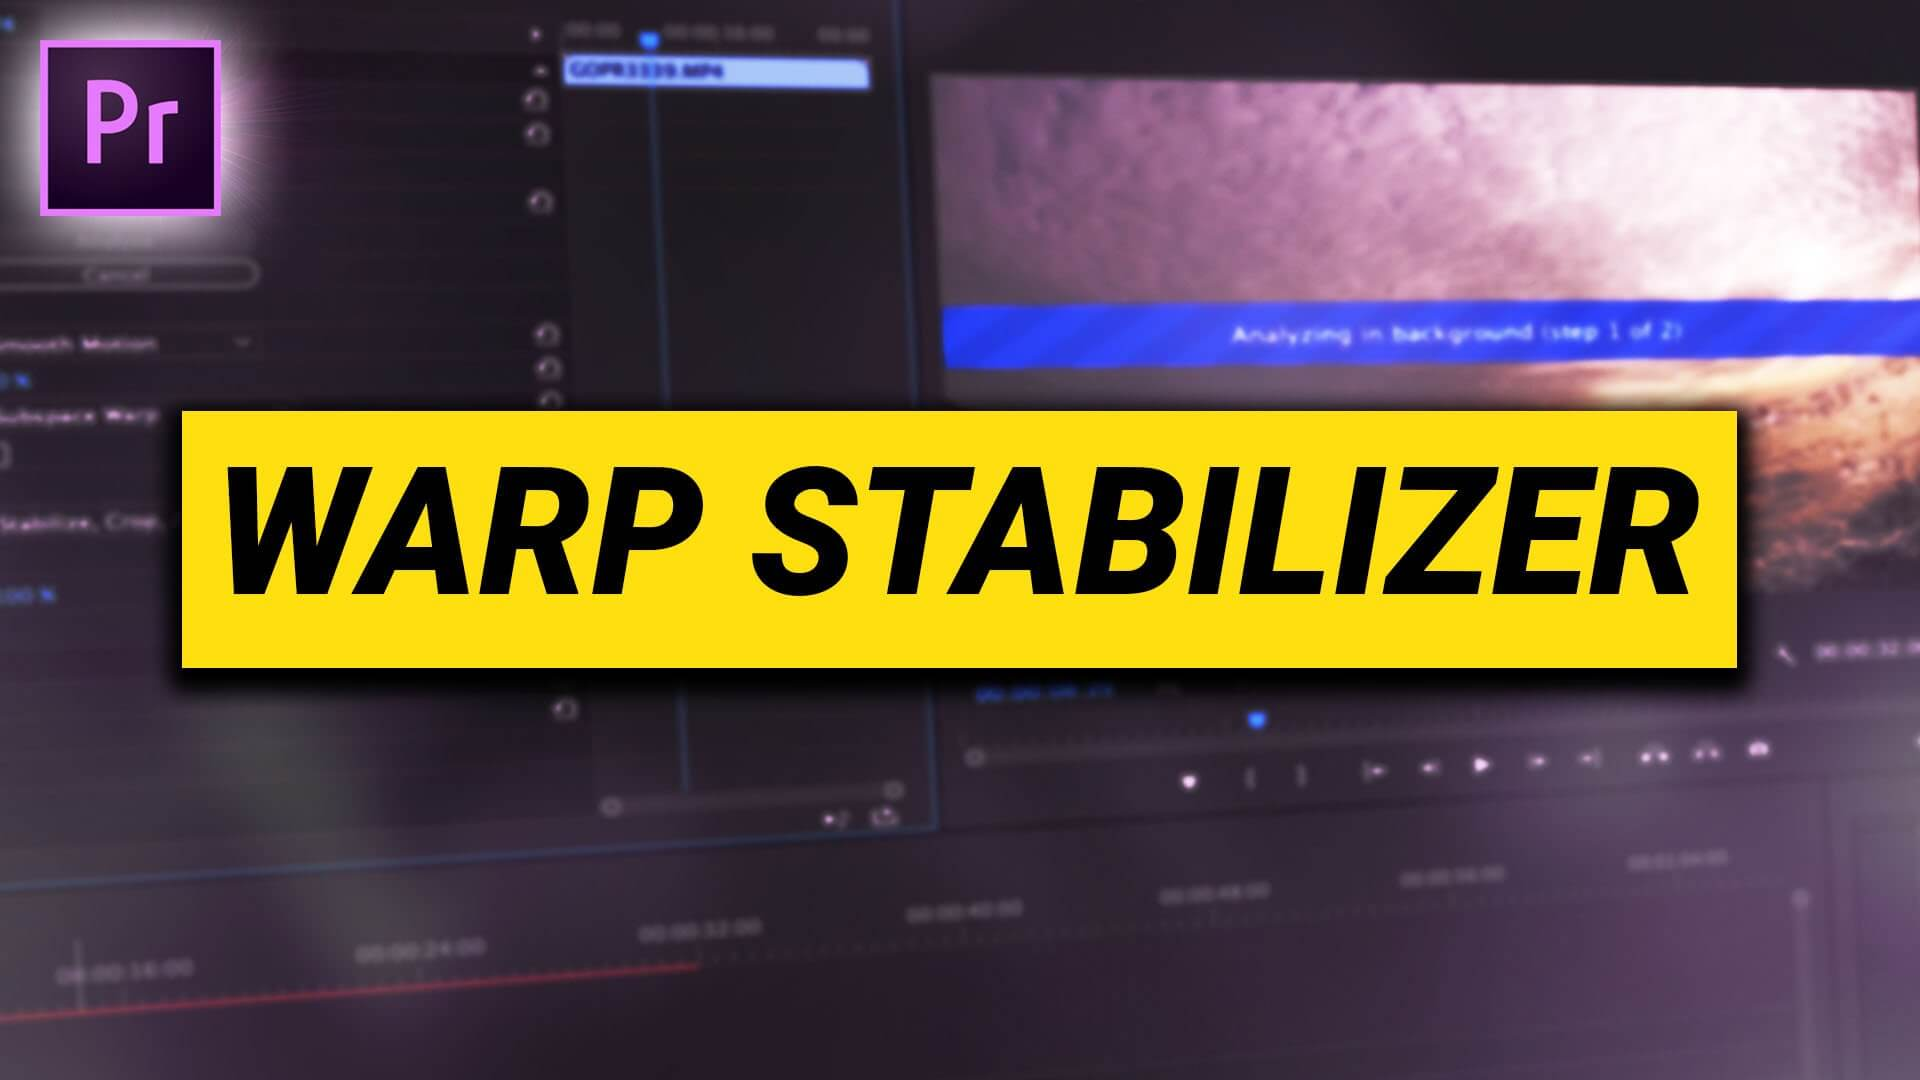 pwarp-stabilizer-premiere-pro